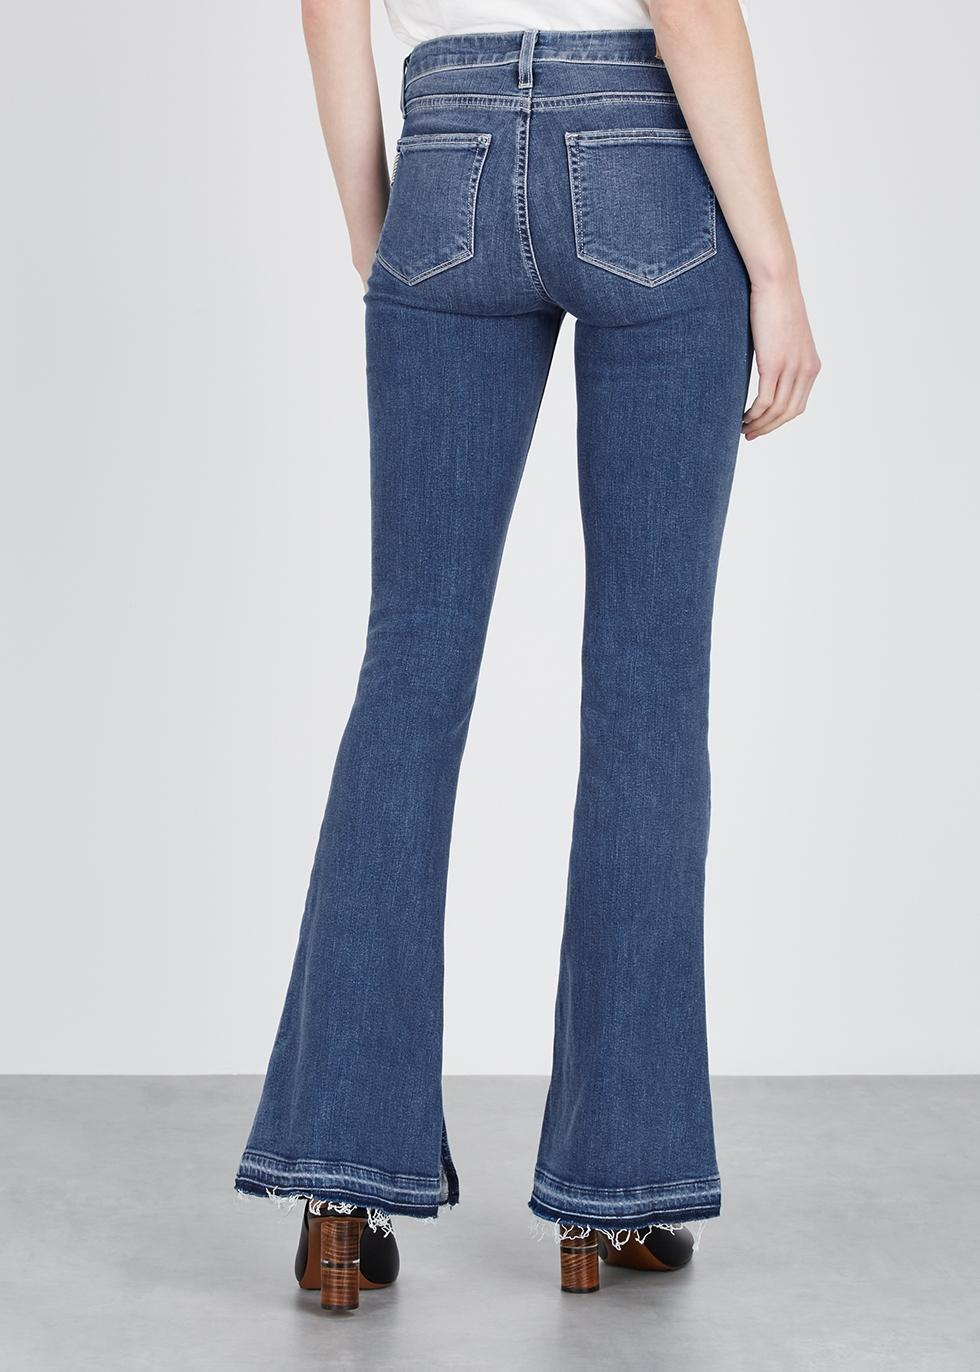 Lou Lou light blue flared jeans - Paige